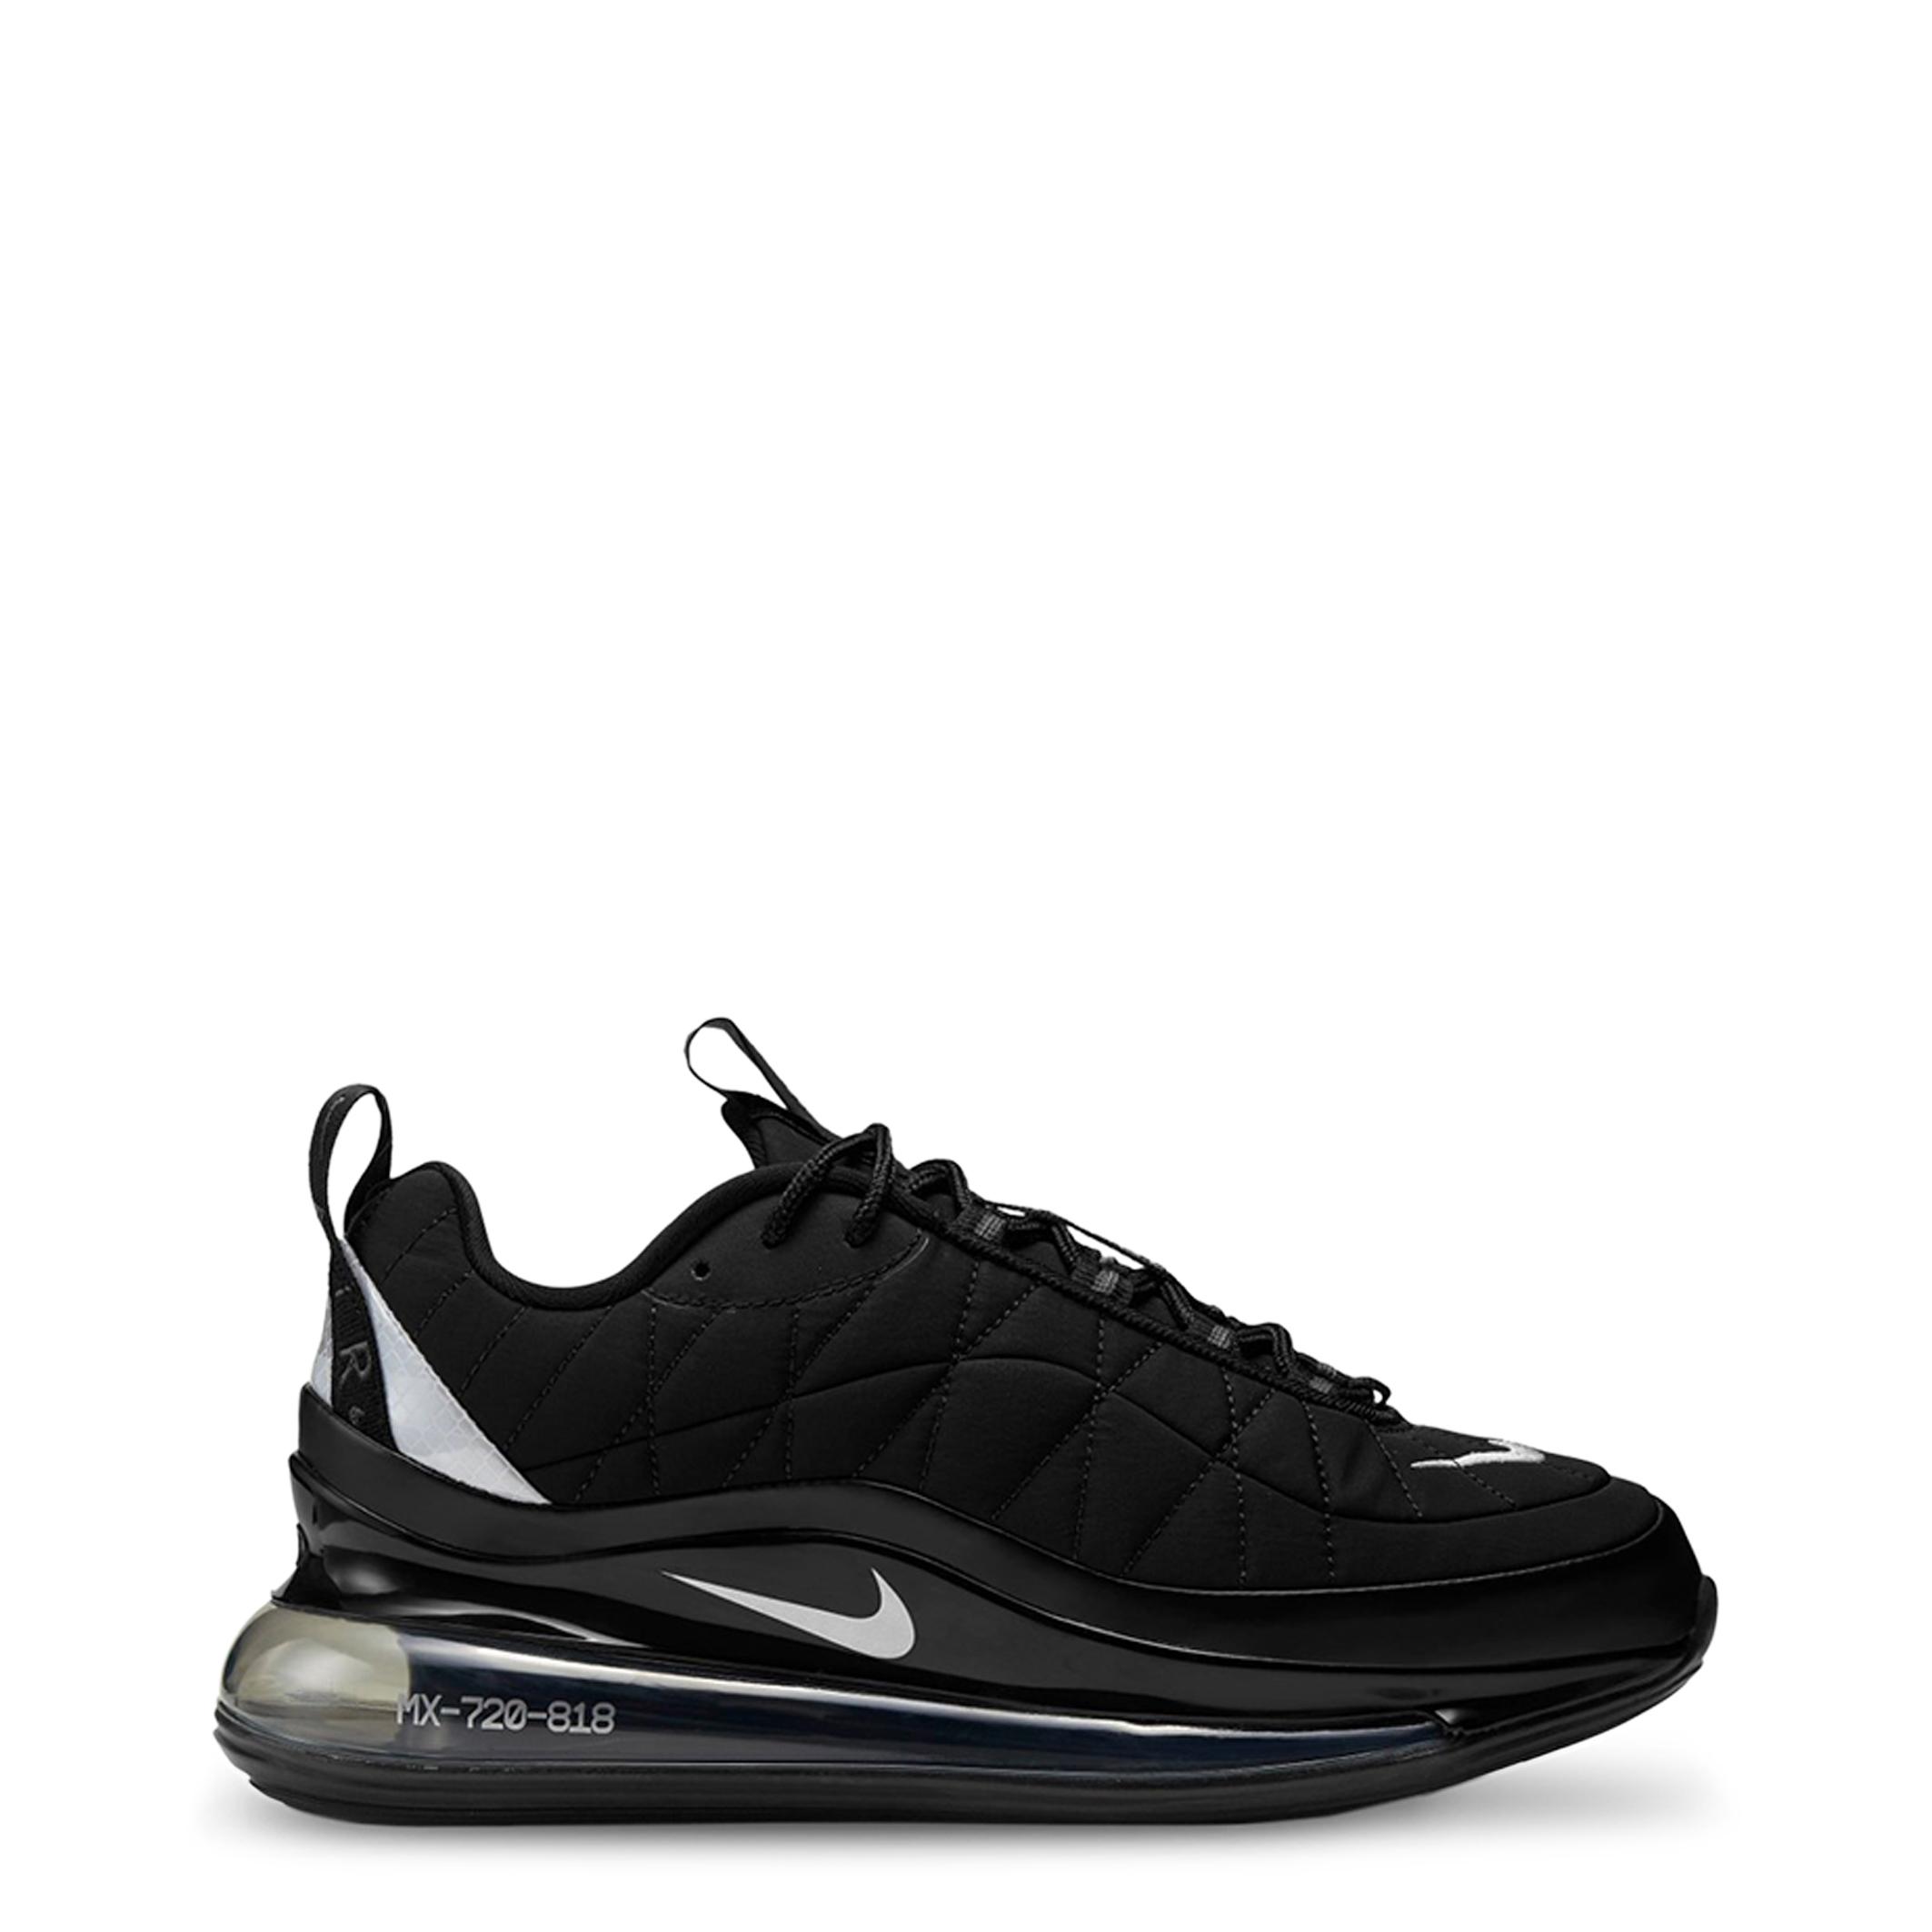 Sneakers Nike – MX-720-818